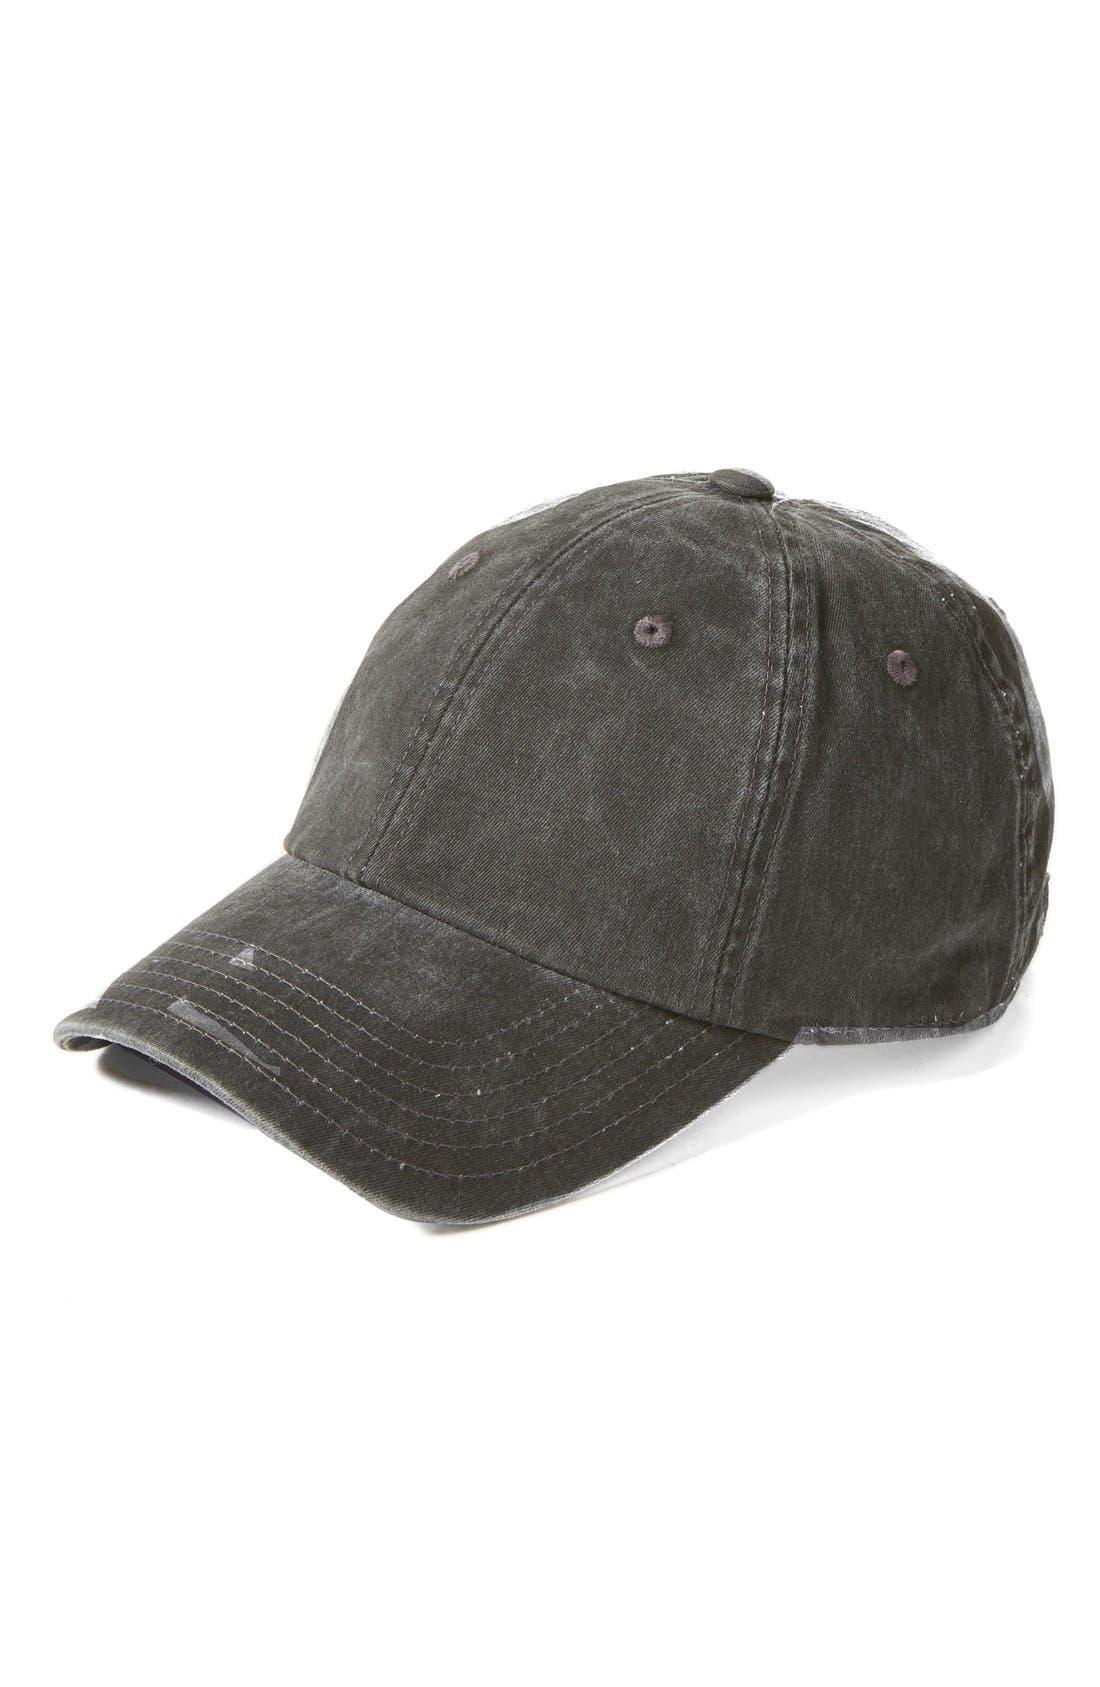 Main Image - American Needle Washed Baseball Cap